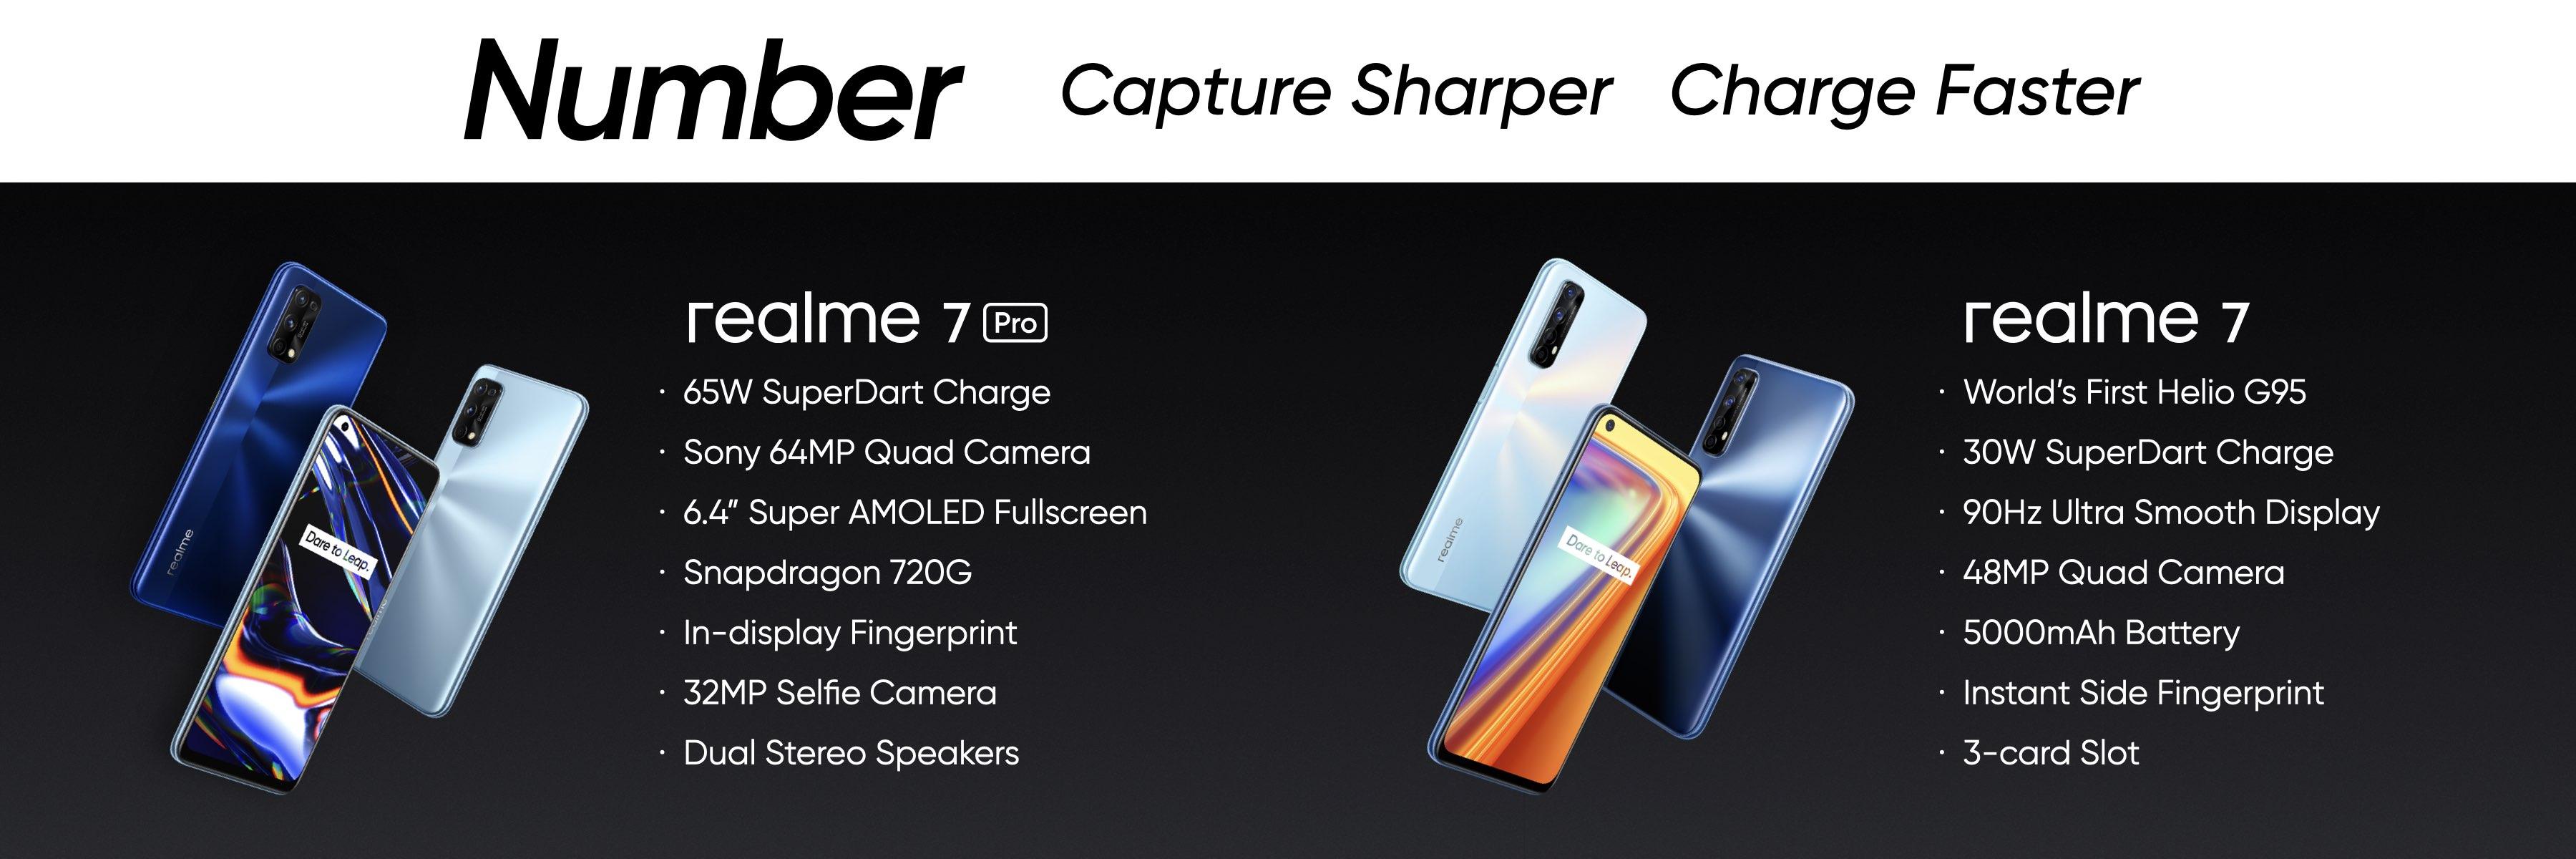 02_【4G產品線】realme數字系列,主打閃充和鏡頭。